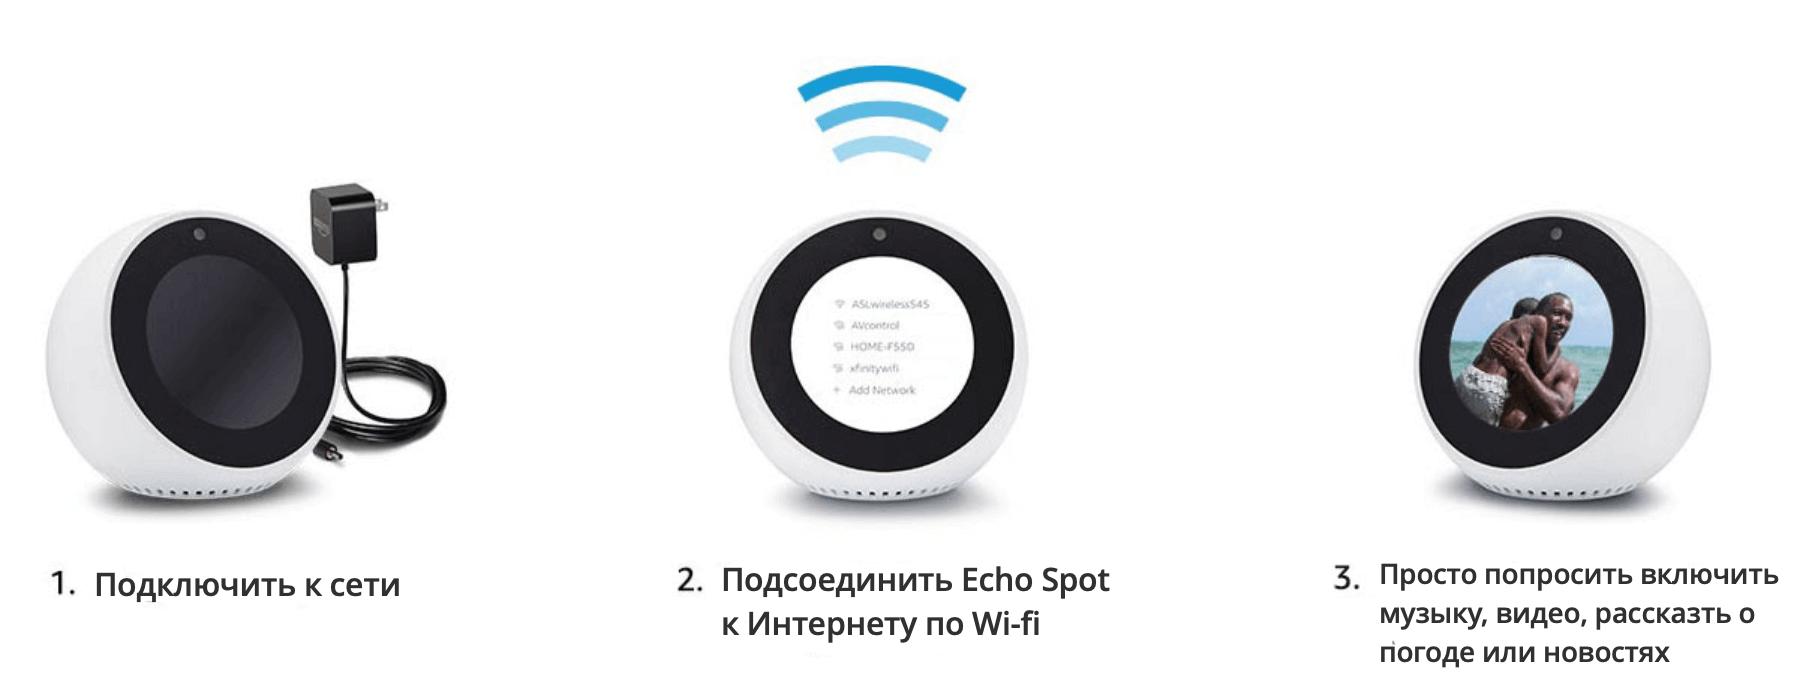 установка echo spot